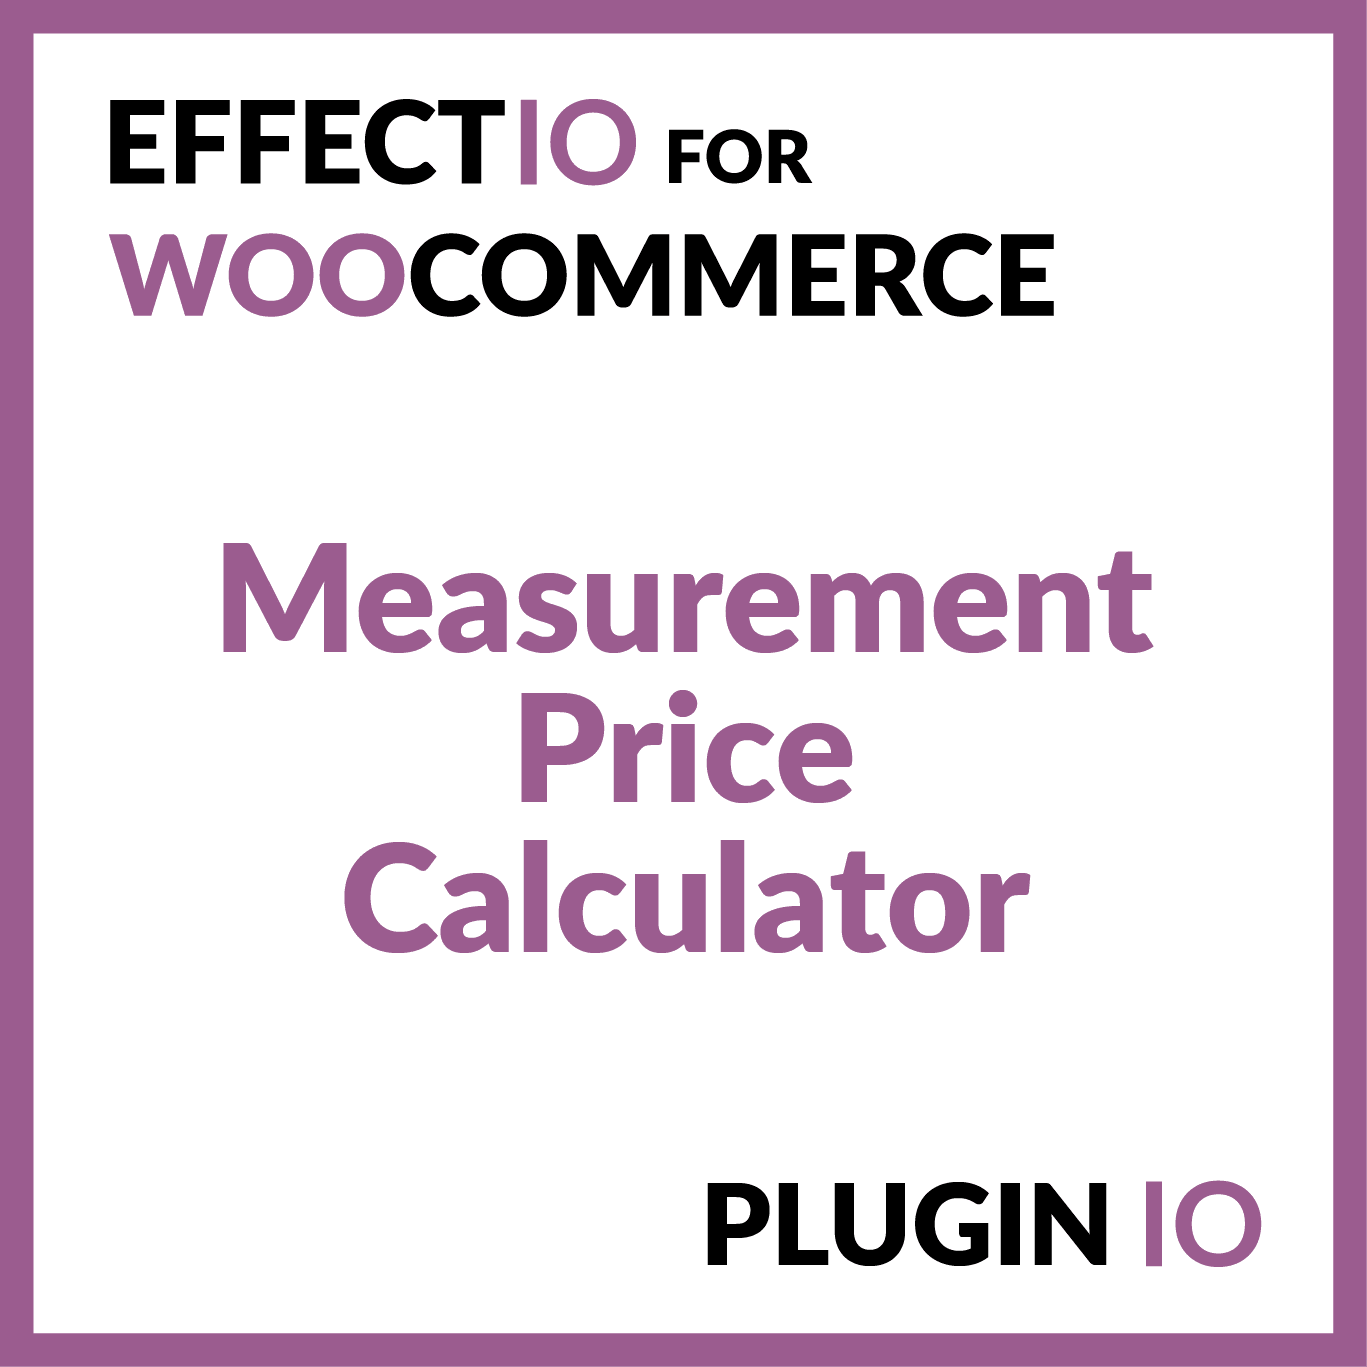 effectio woocommerce measurement price calculator 3 13 5